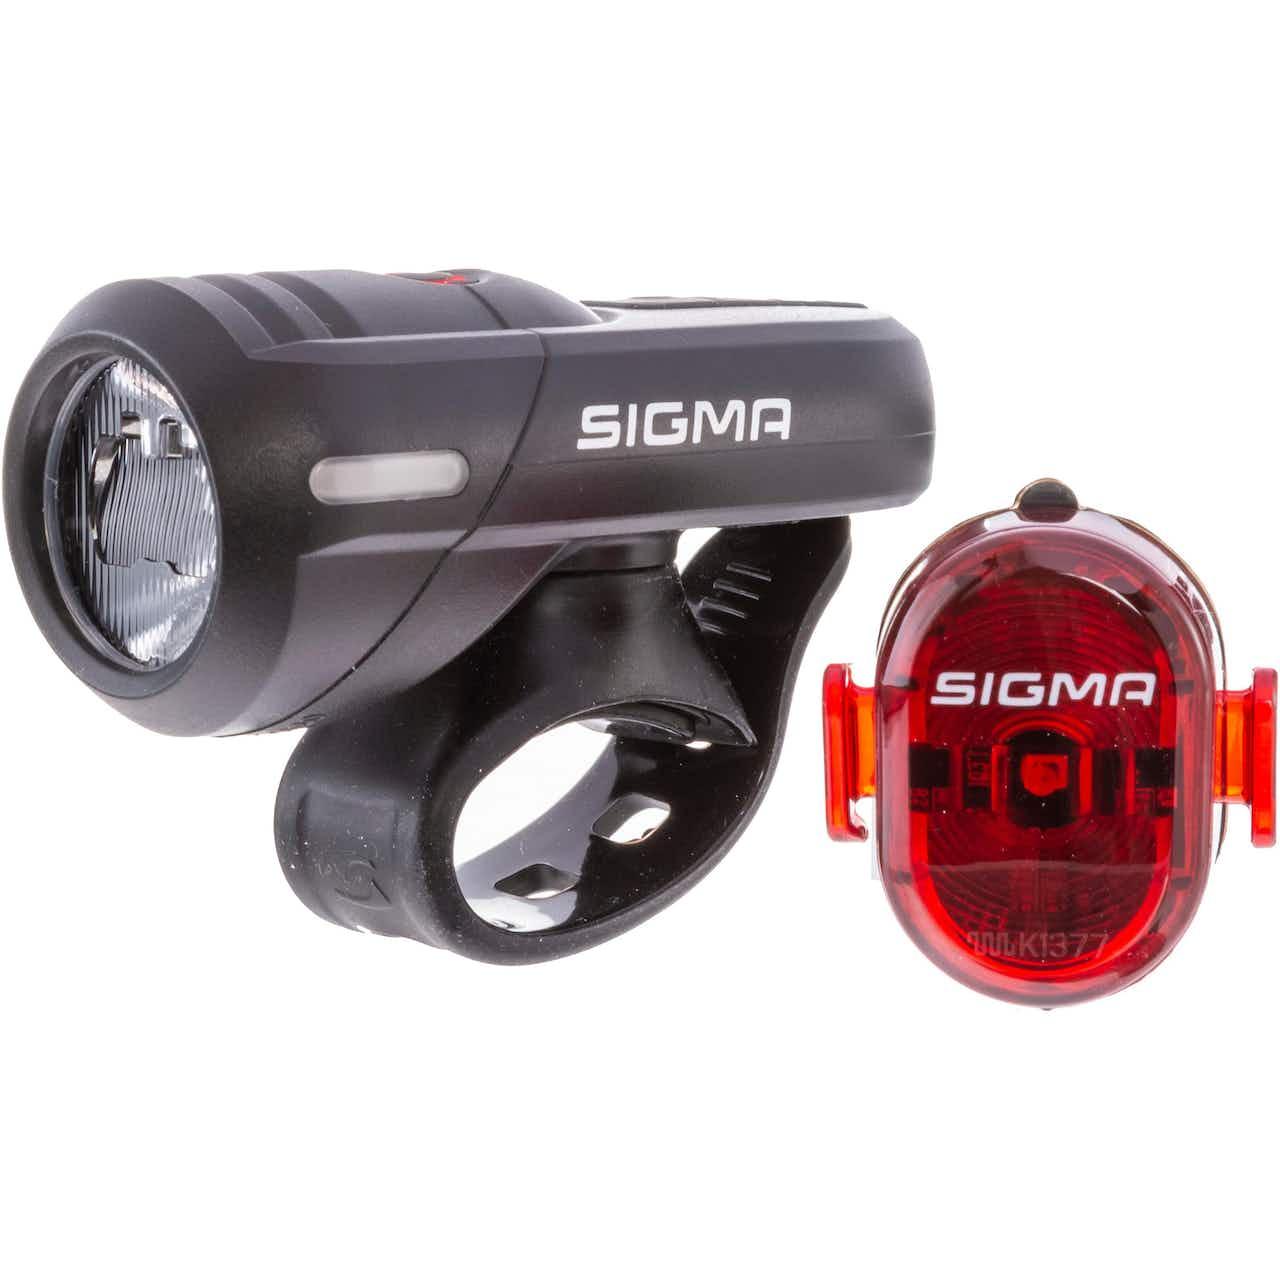 SIGMA AURA 45 USB NUGGET II RL K-SET Fahrradbeleuchtung